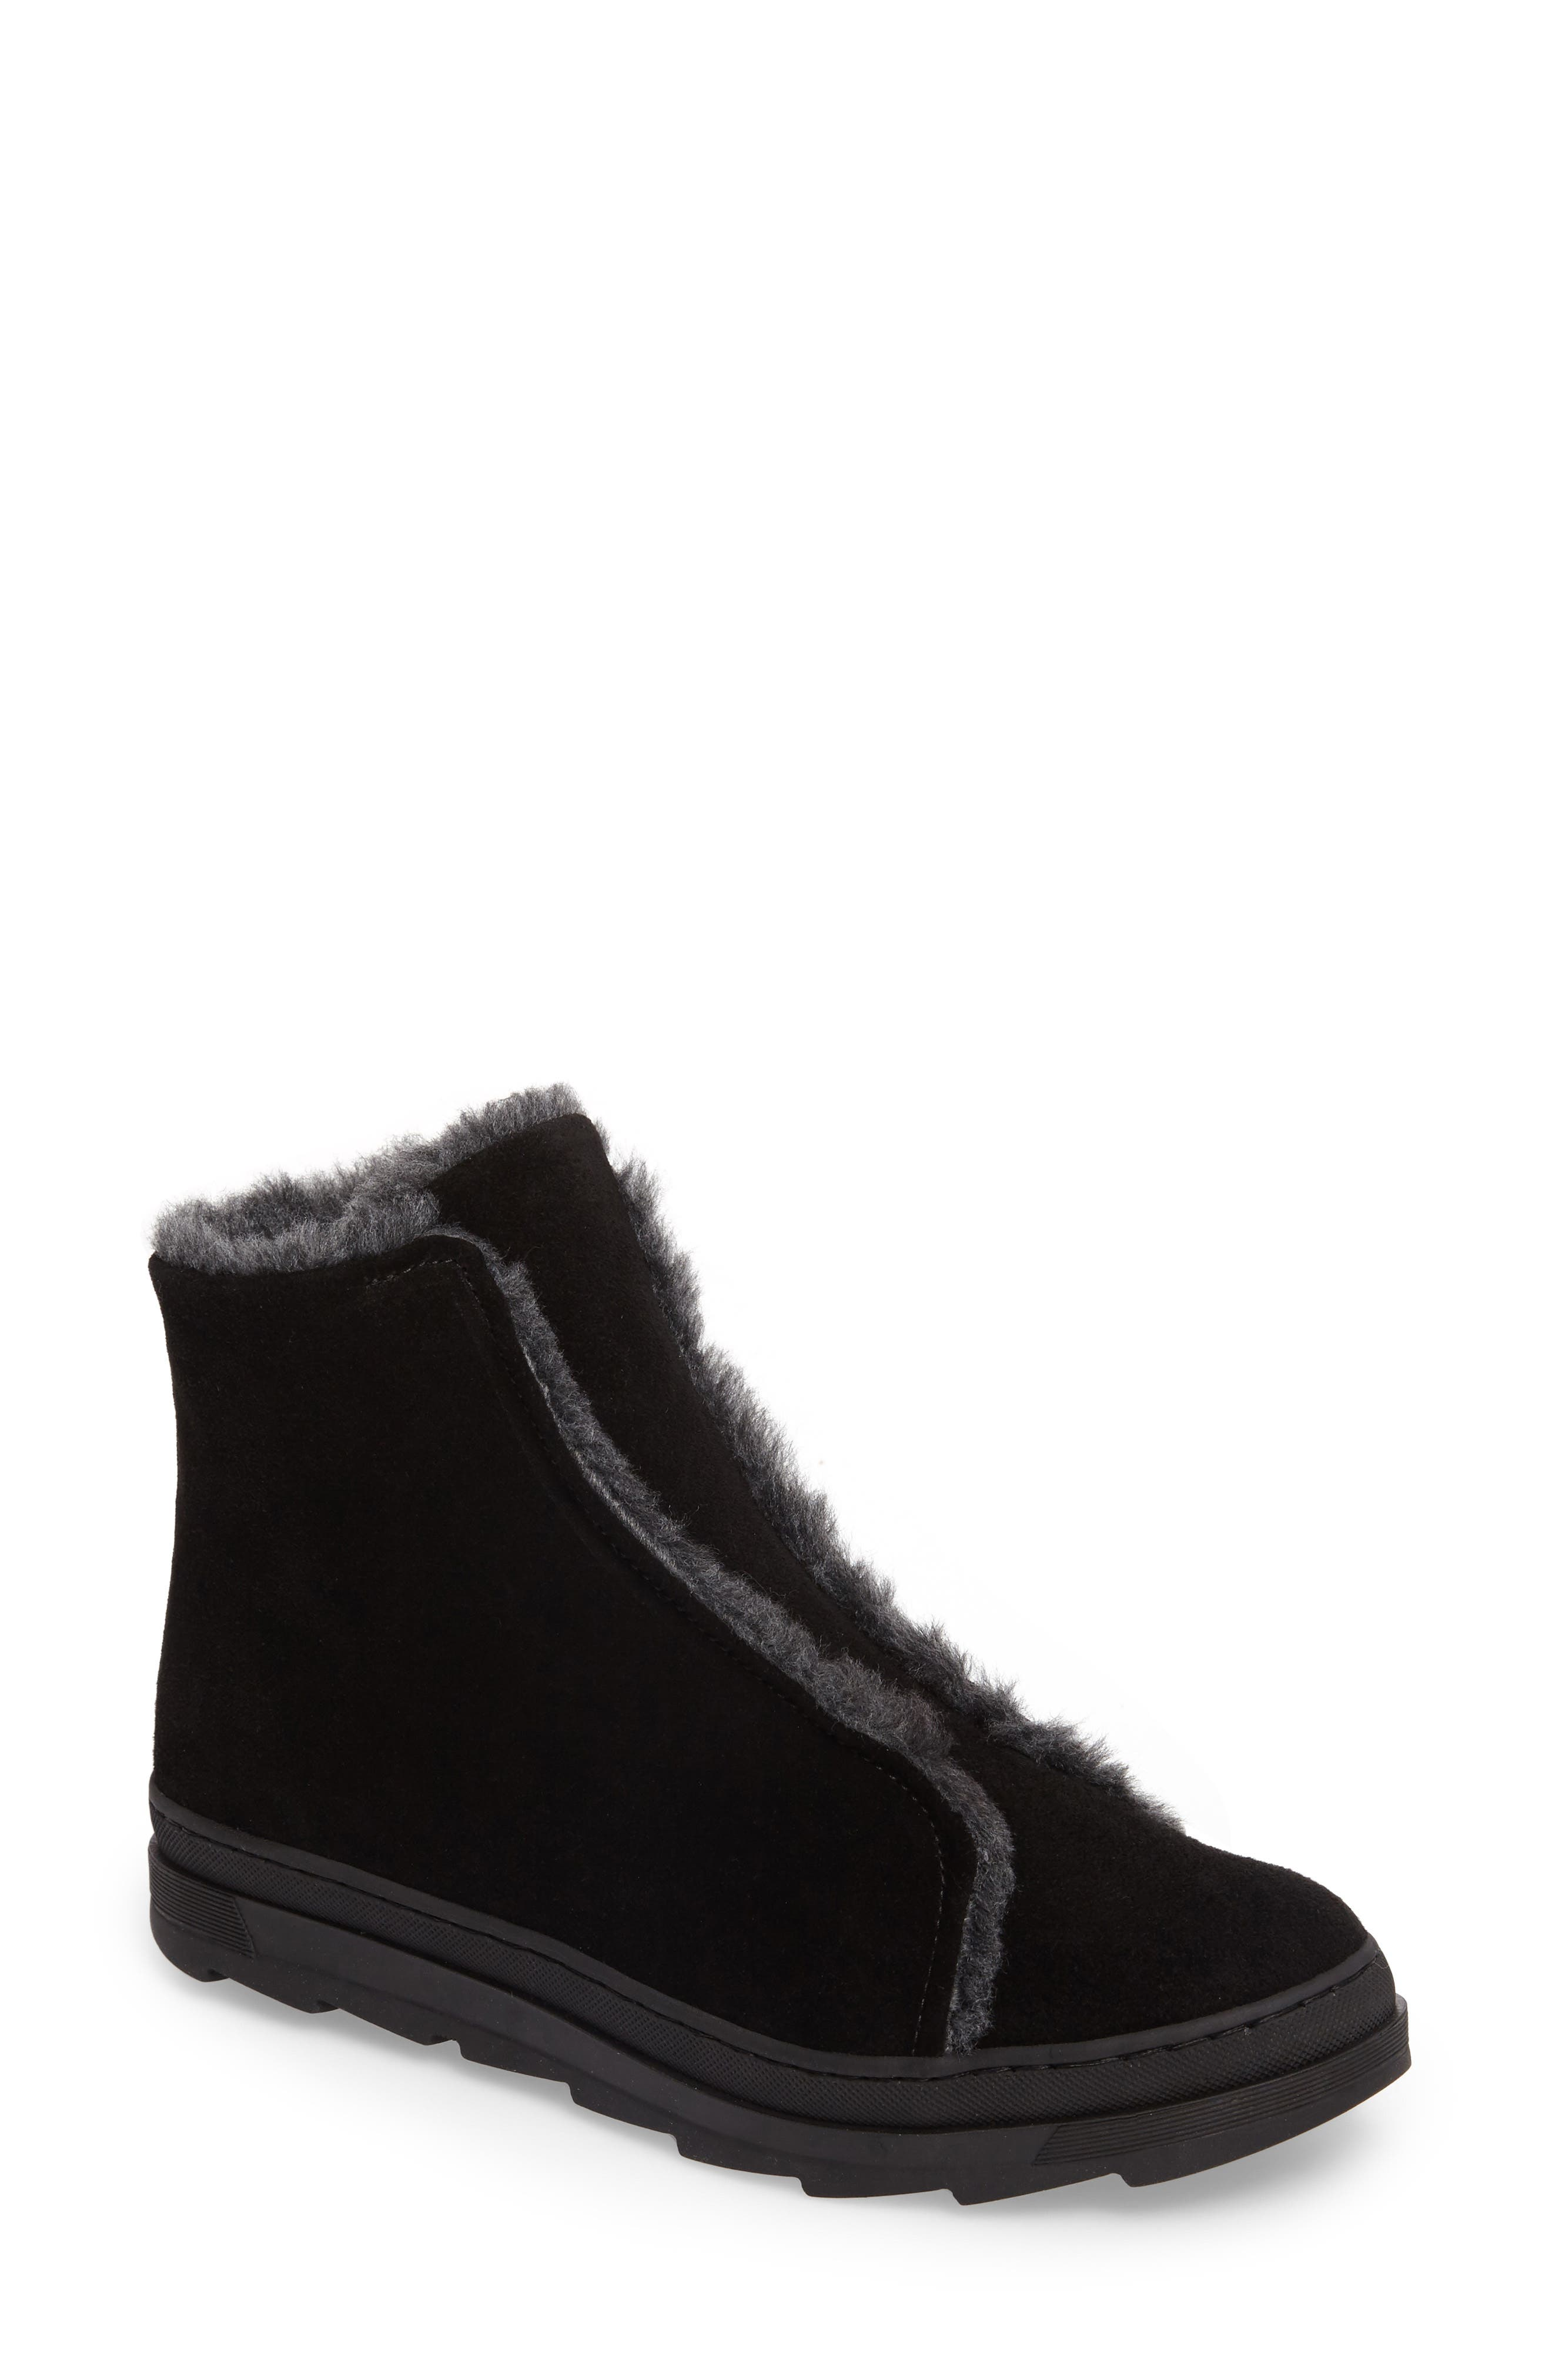 Virina Boot,                         Main,                         color, Black Suede